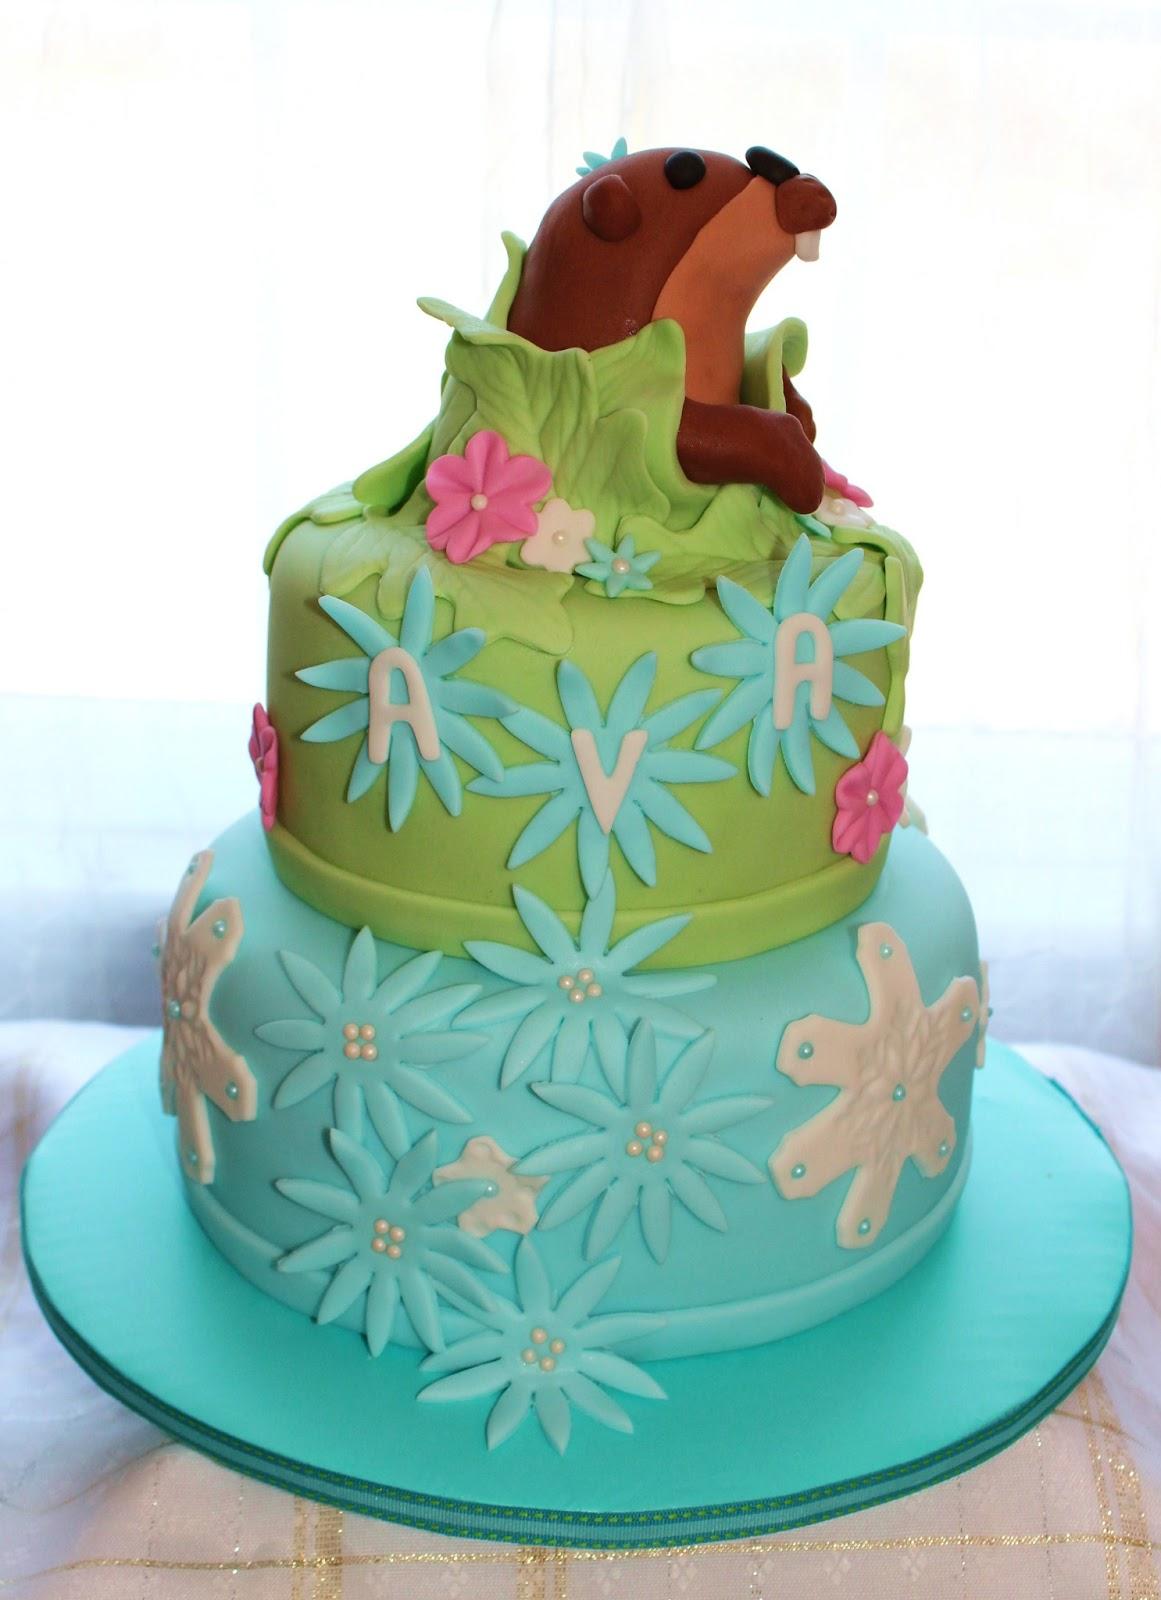 Creative Cakes By Lynn: Groundhog Day Birthday Cake